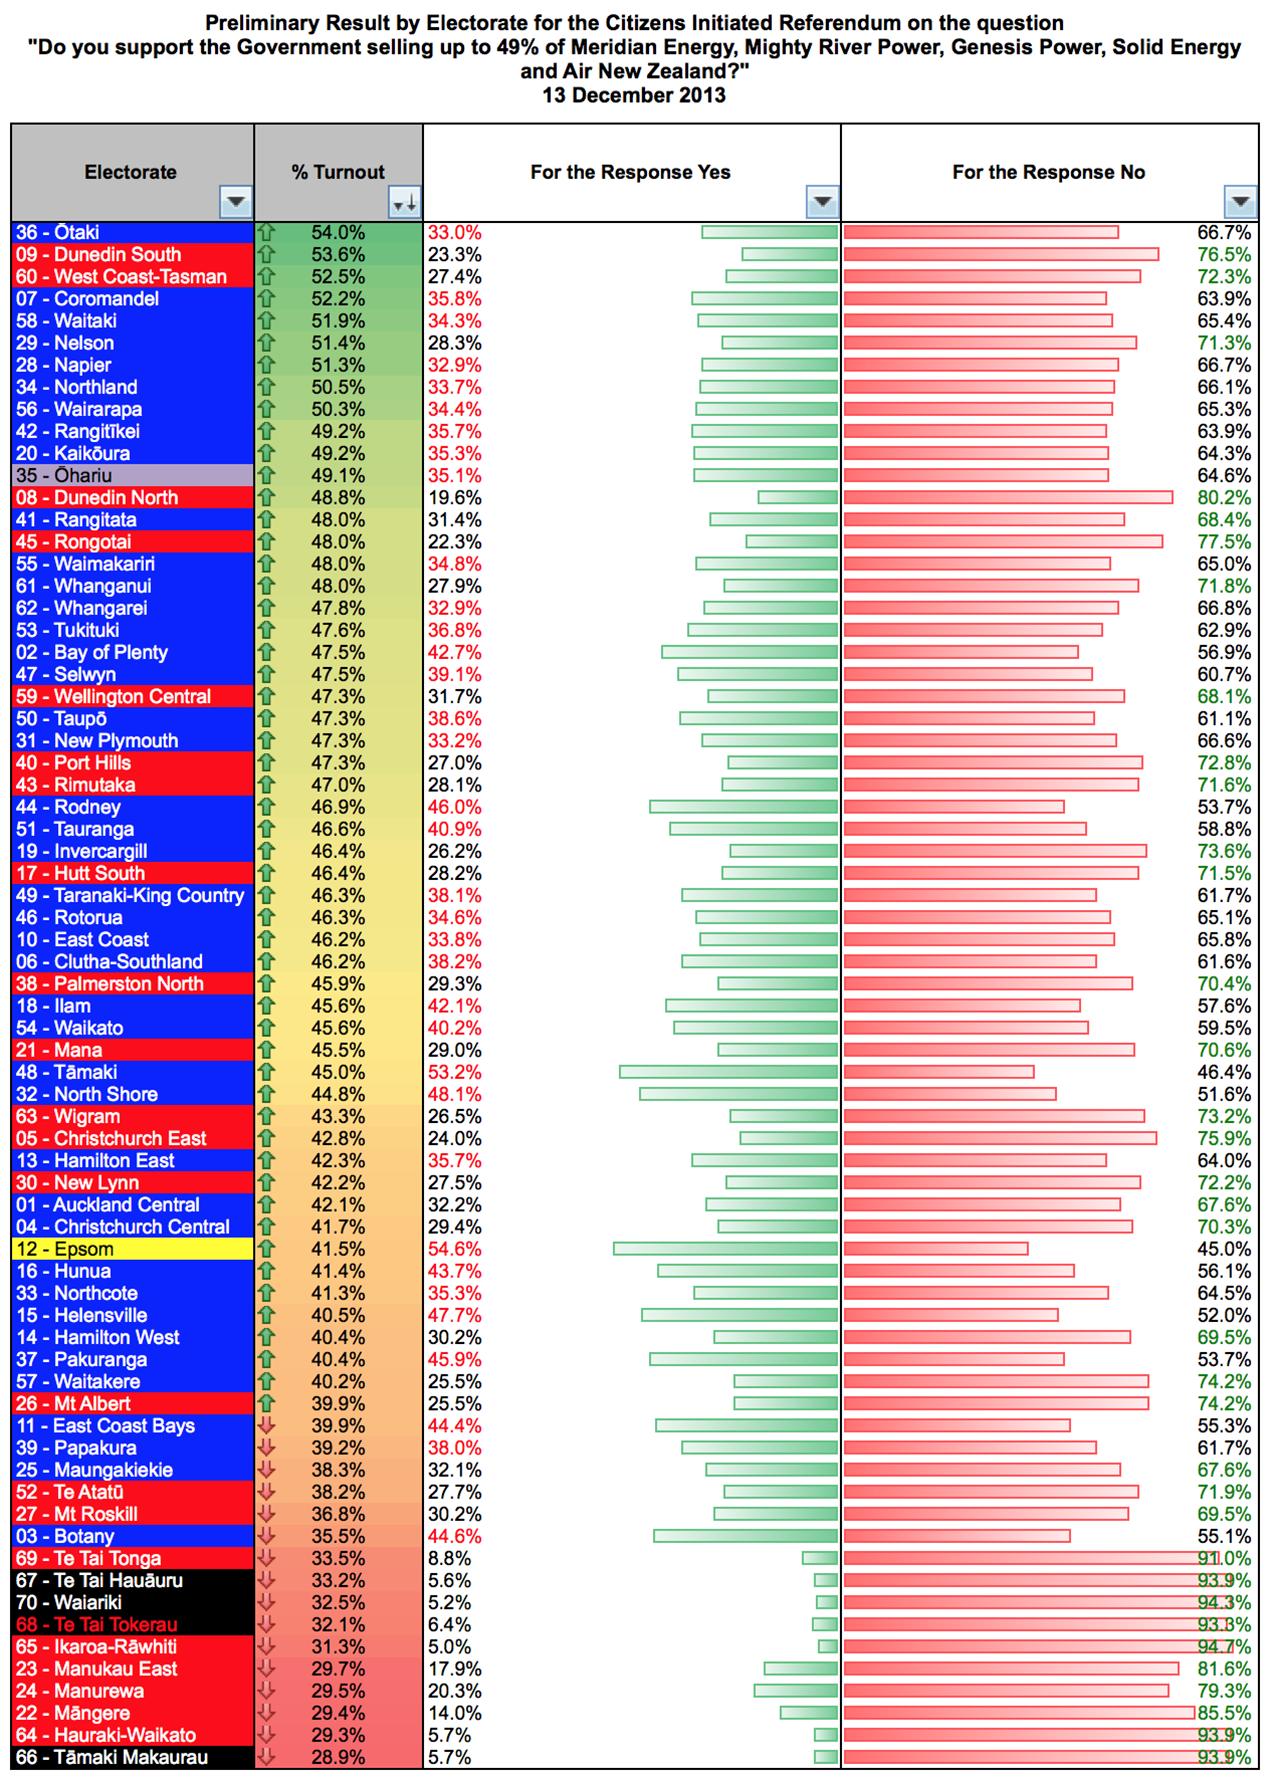 turnout high-low data - Imgur